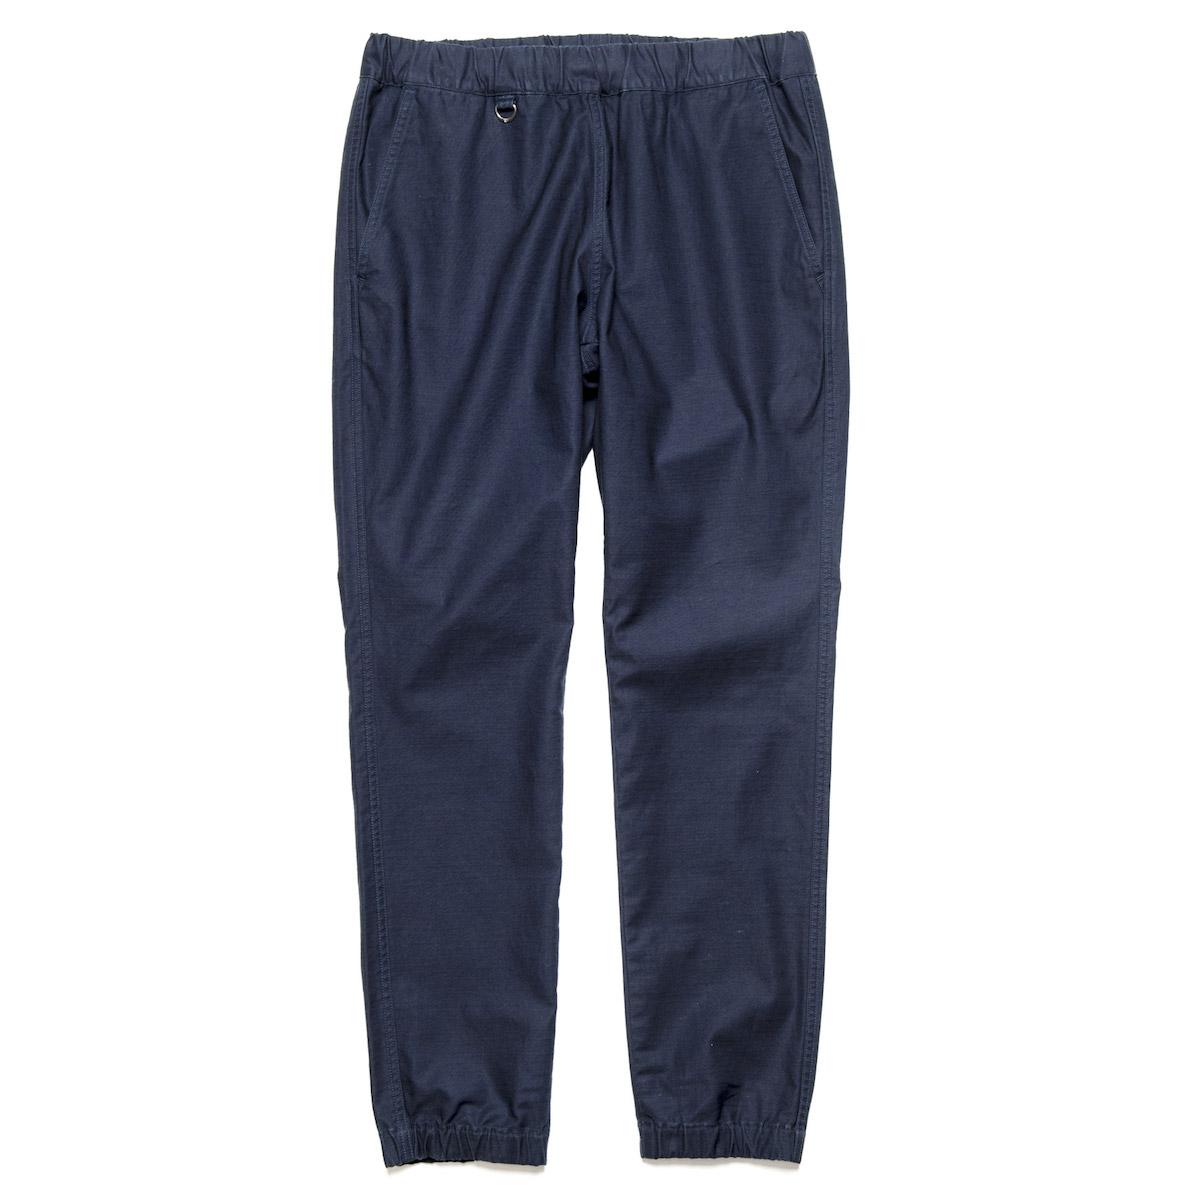 uniform experiment / SLIM-FIT JOGGER PANT